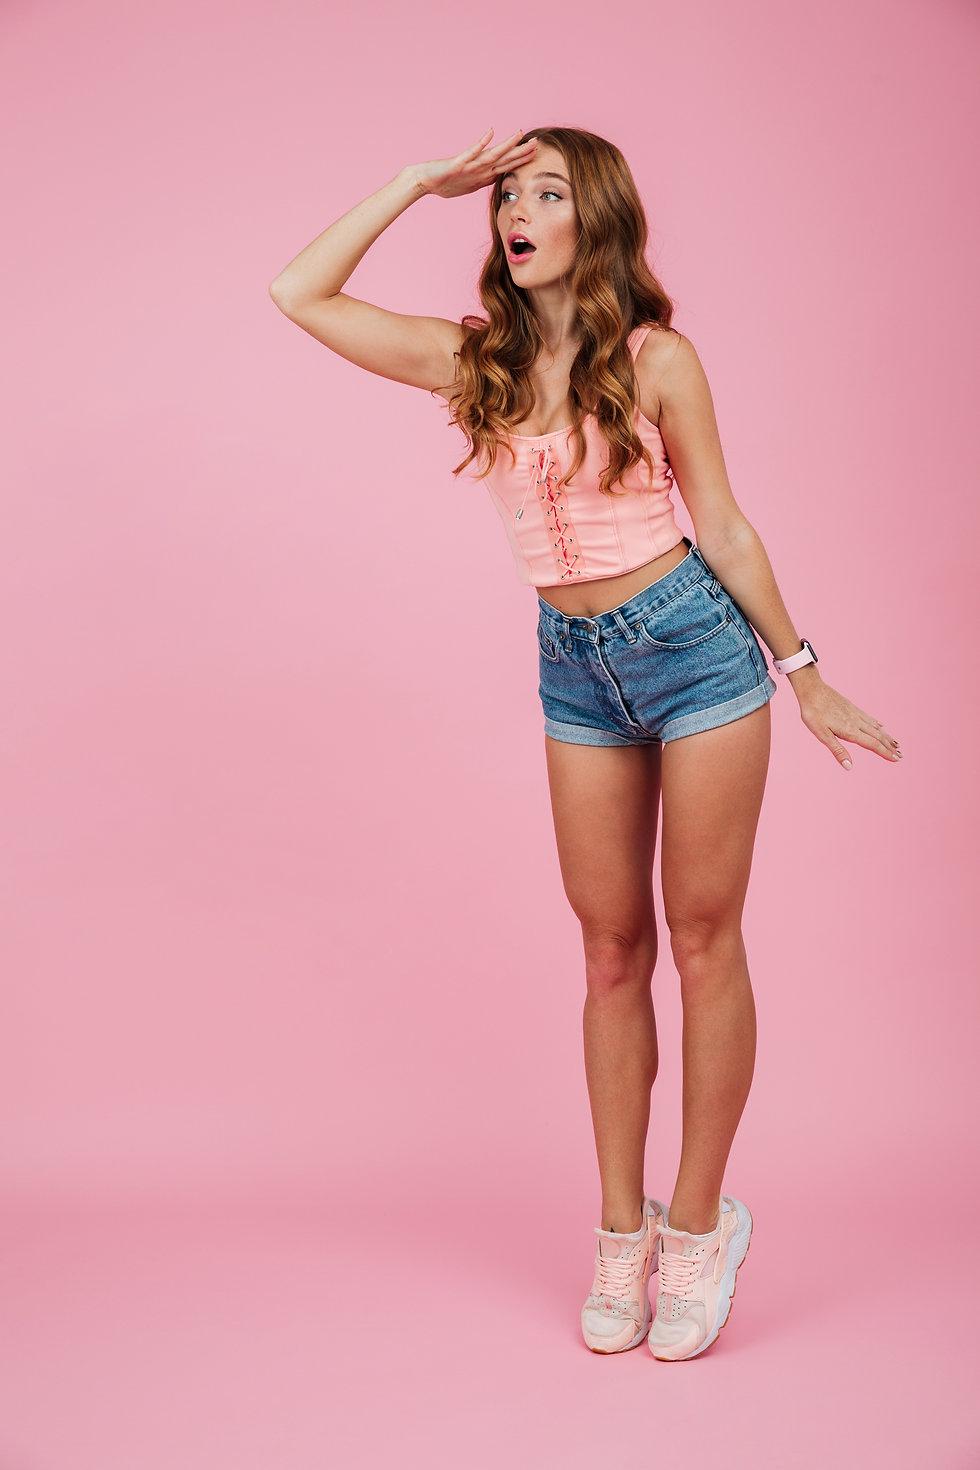 full-length-portrait-beautiful-woman-summer-clothes.jpg